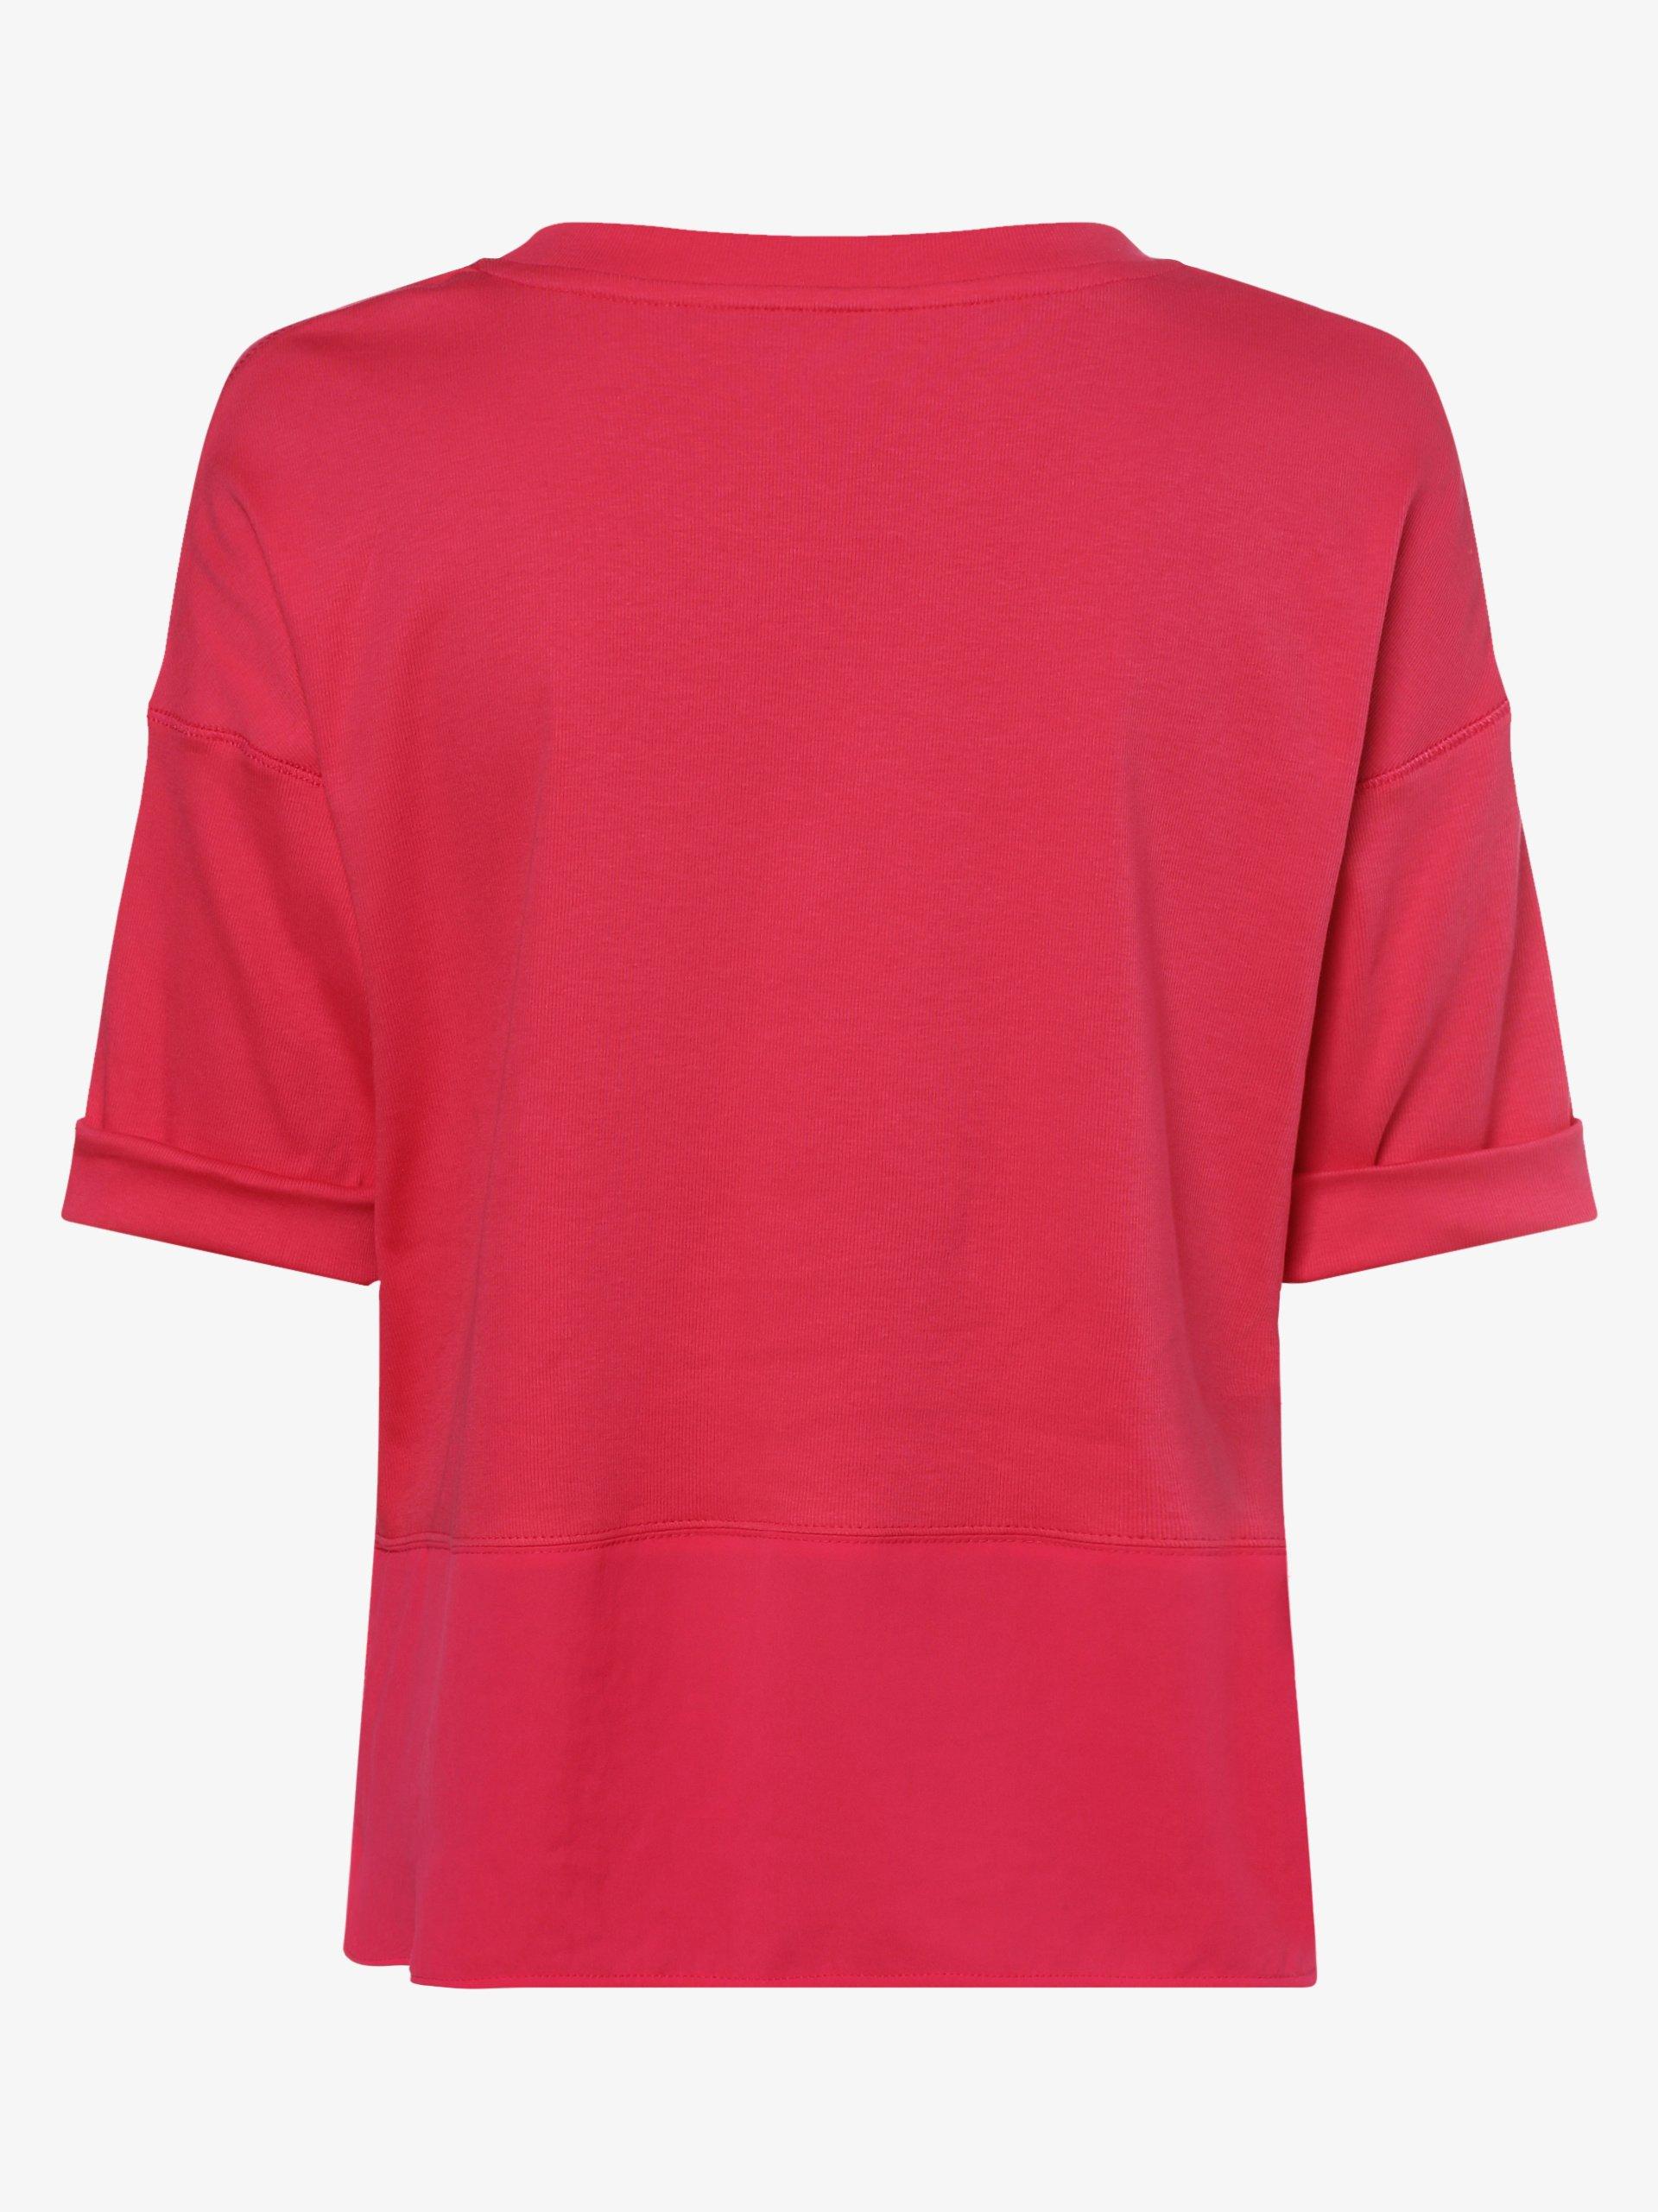 Marc Cain Sports Damen Shirt